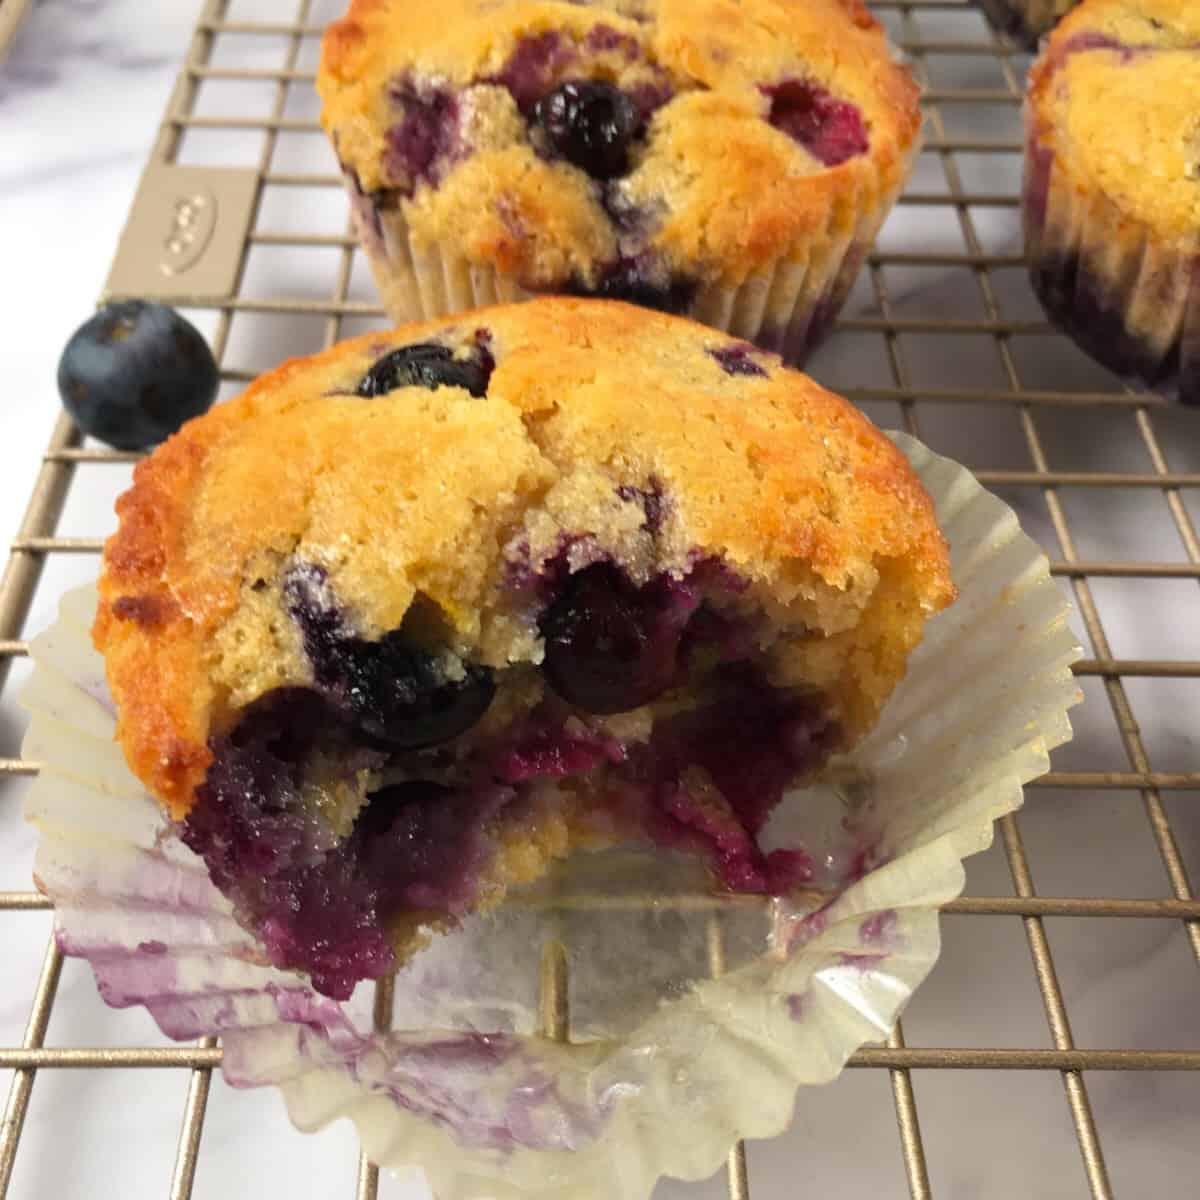 half eaten blueberry muffin